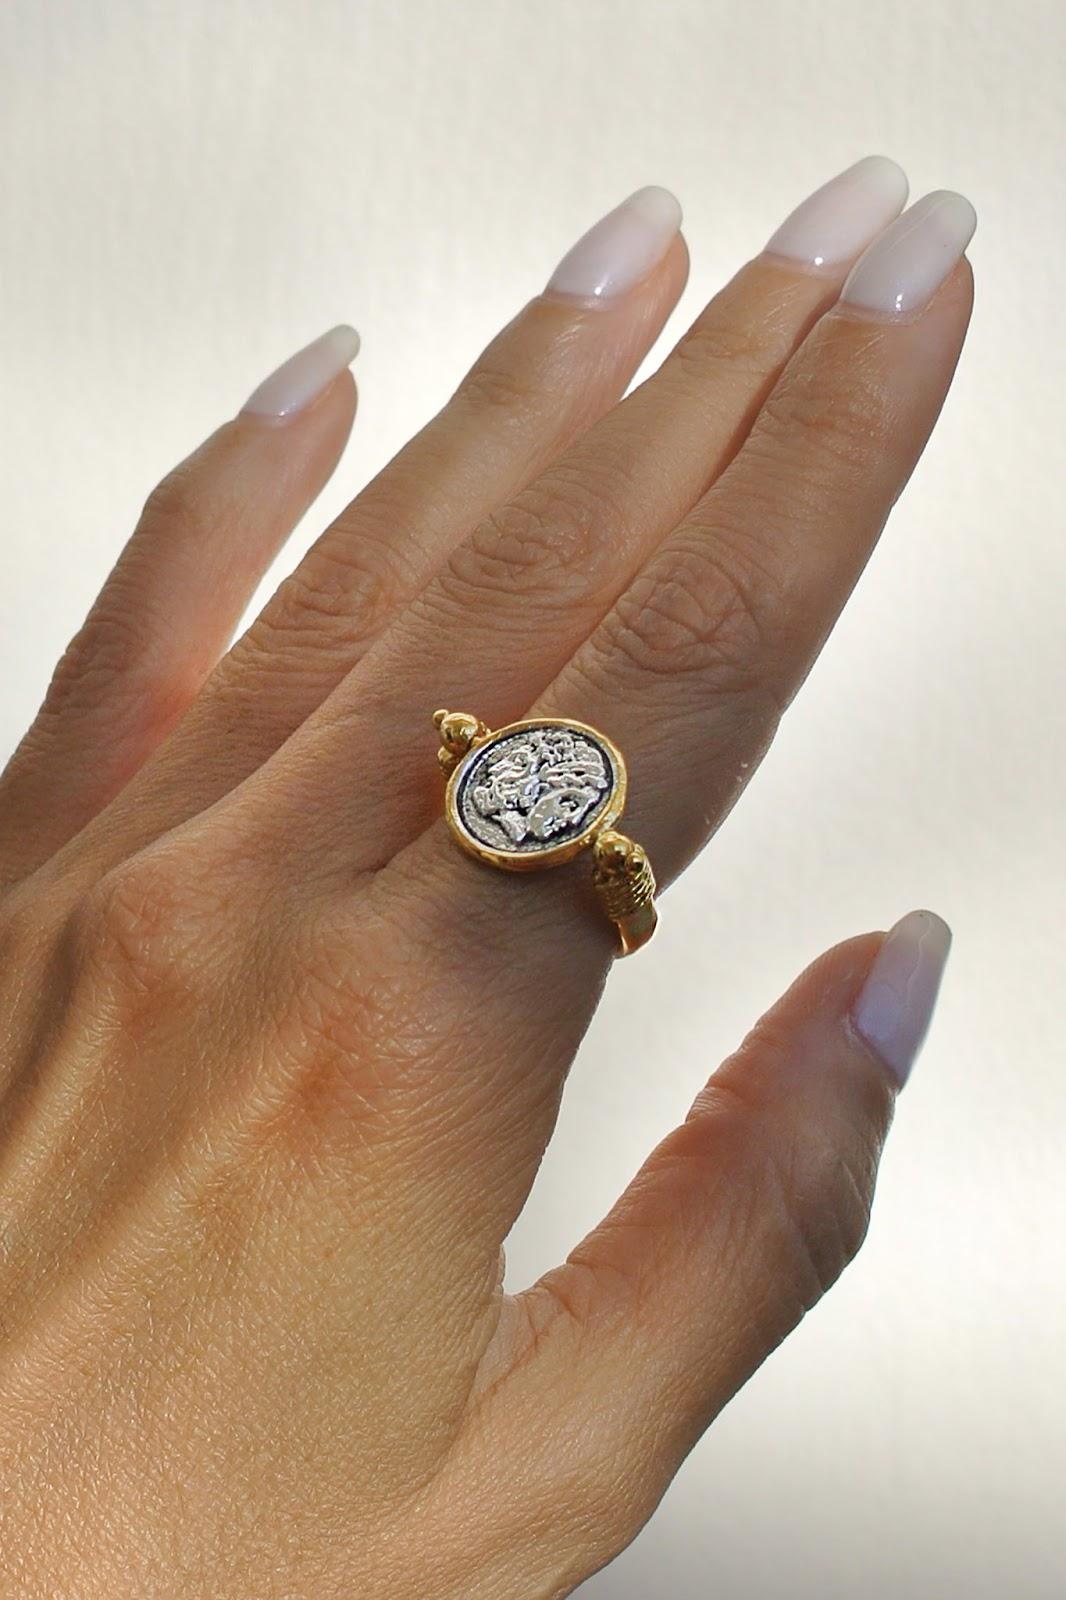 Janus Ring Necklace